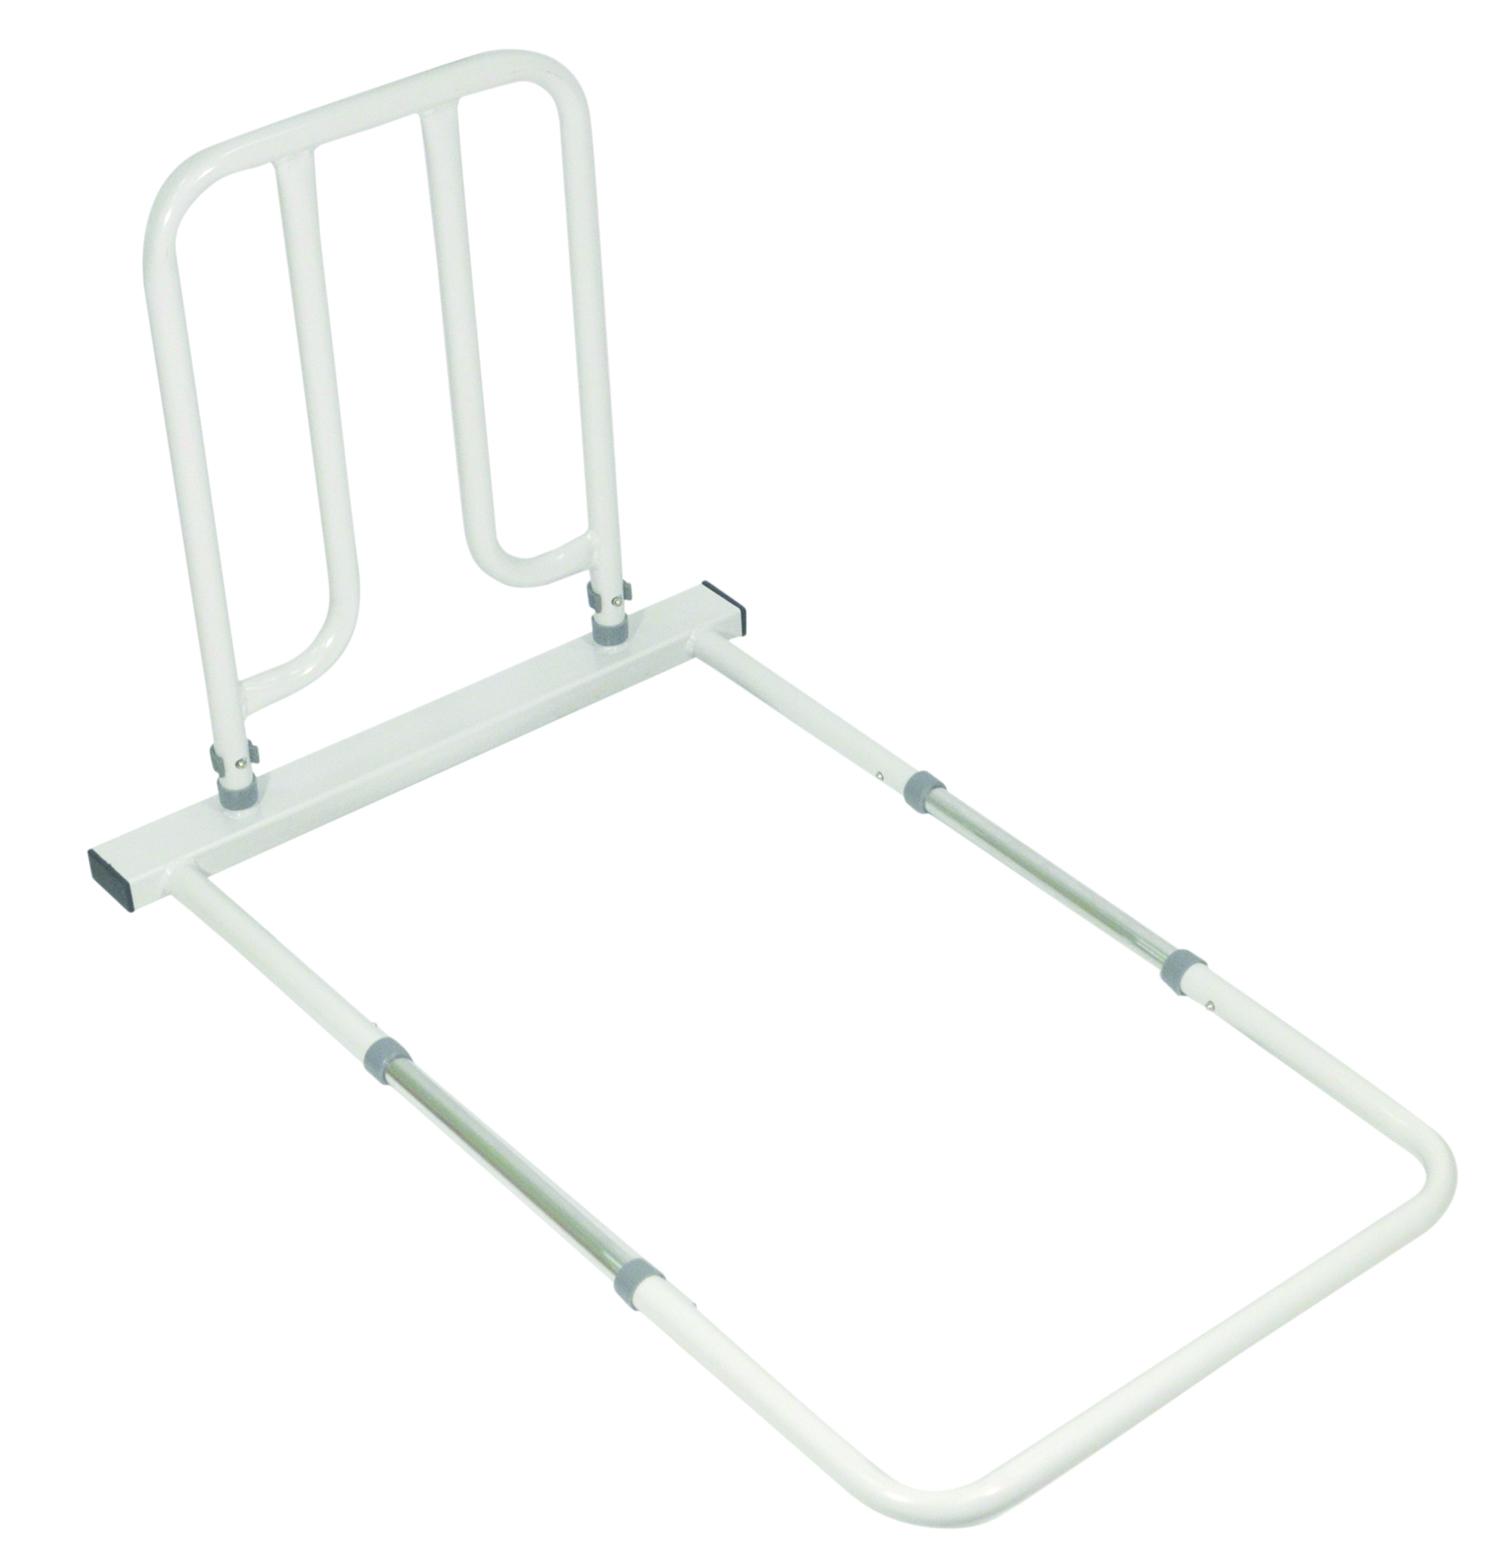 Aidapt Solo Bed Lever For Slatted Beds - aidapt - ebay.co.uk